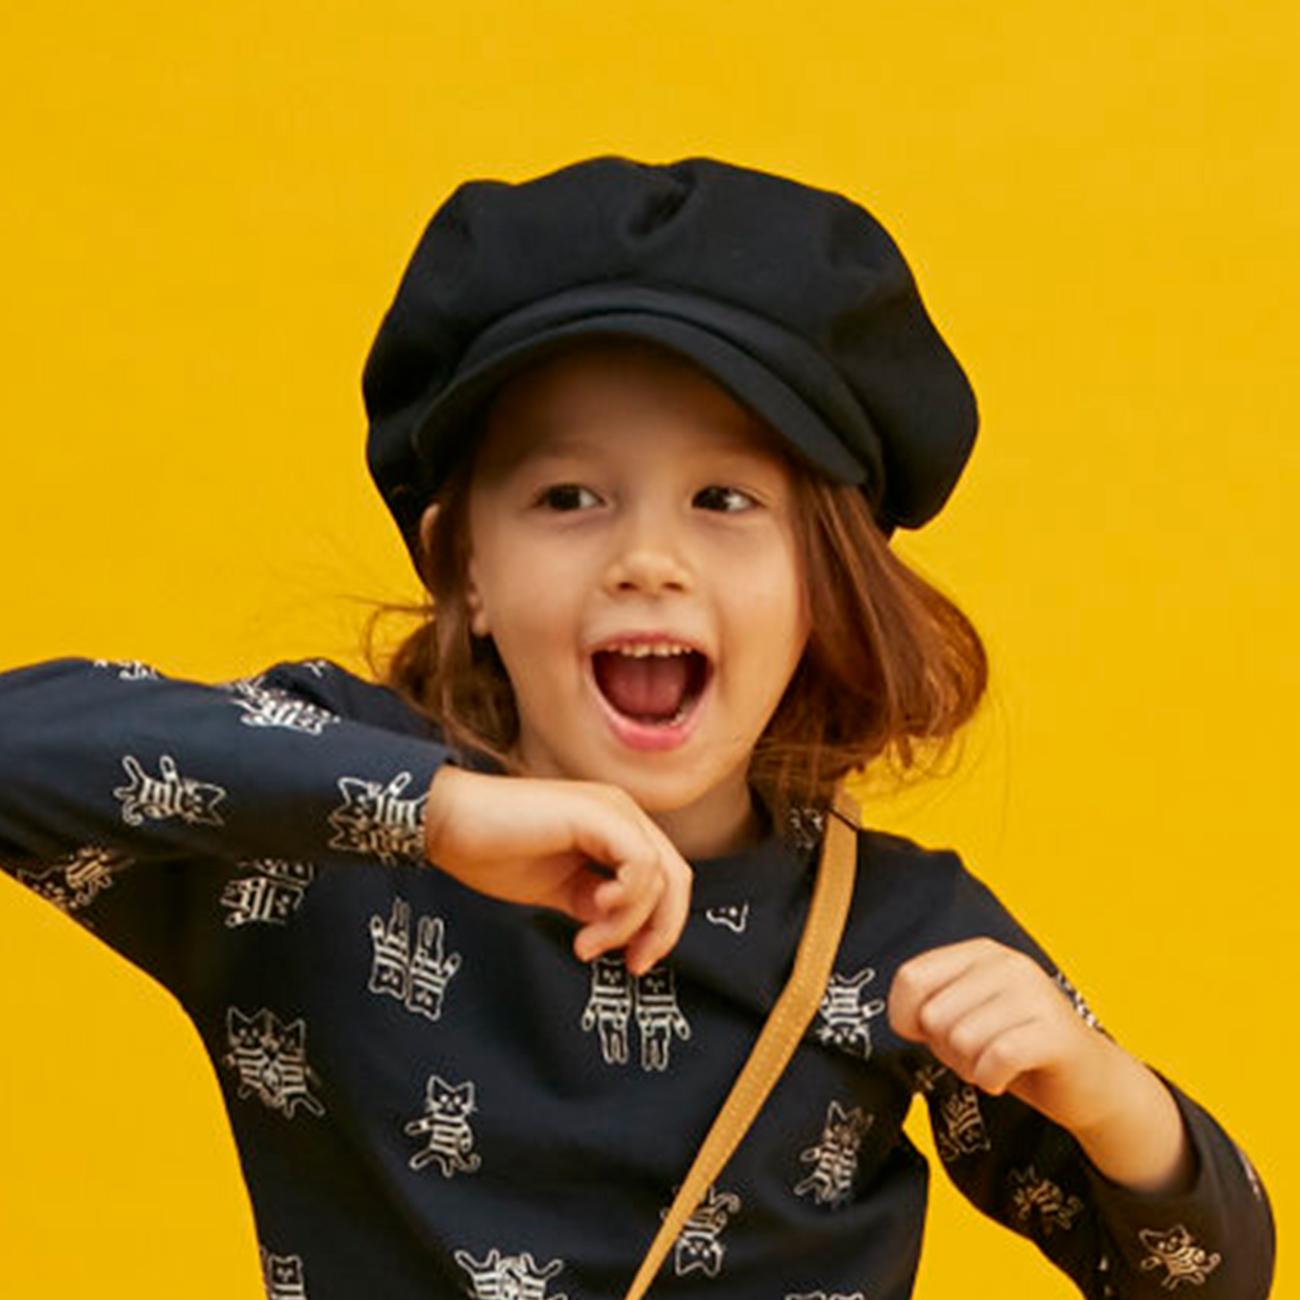 【HusHusH(Kids) (ハッシュアッシュ)】ベーシックキャスケットキッズ 帽子|キャスケット ネイビー